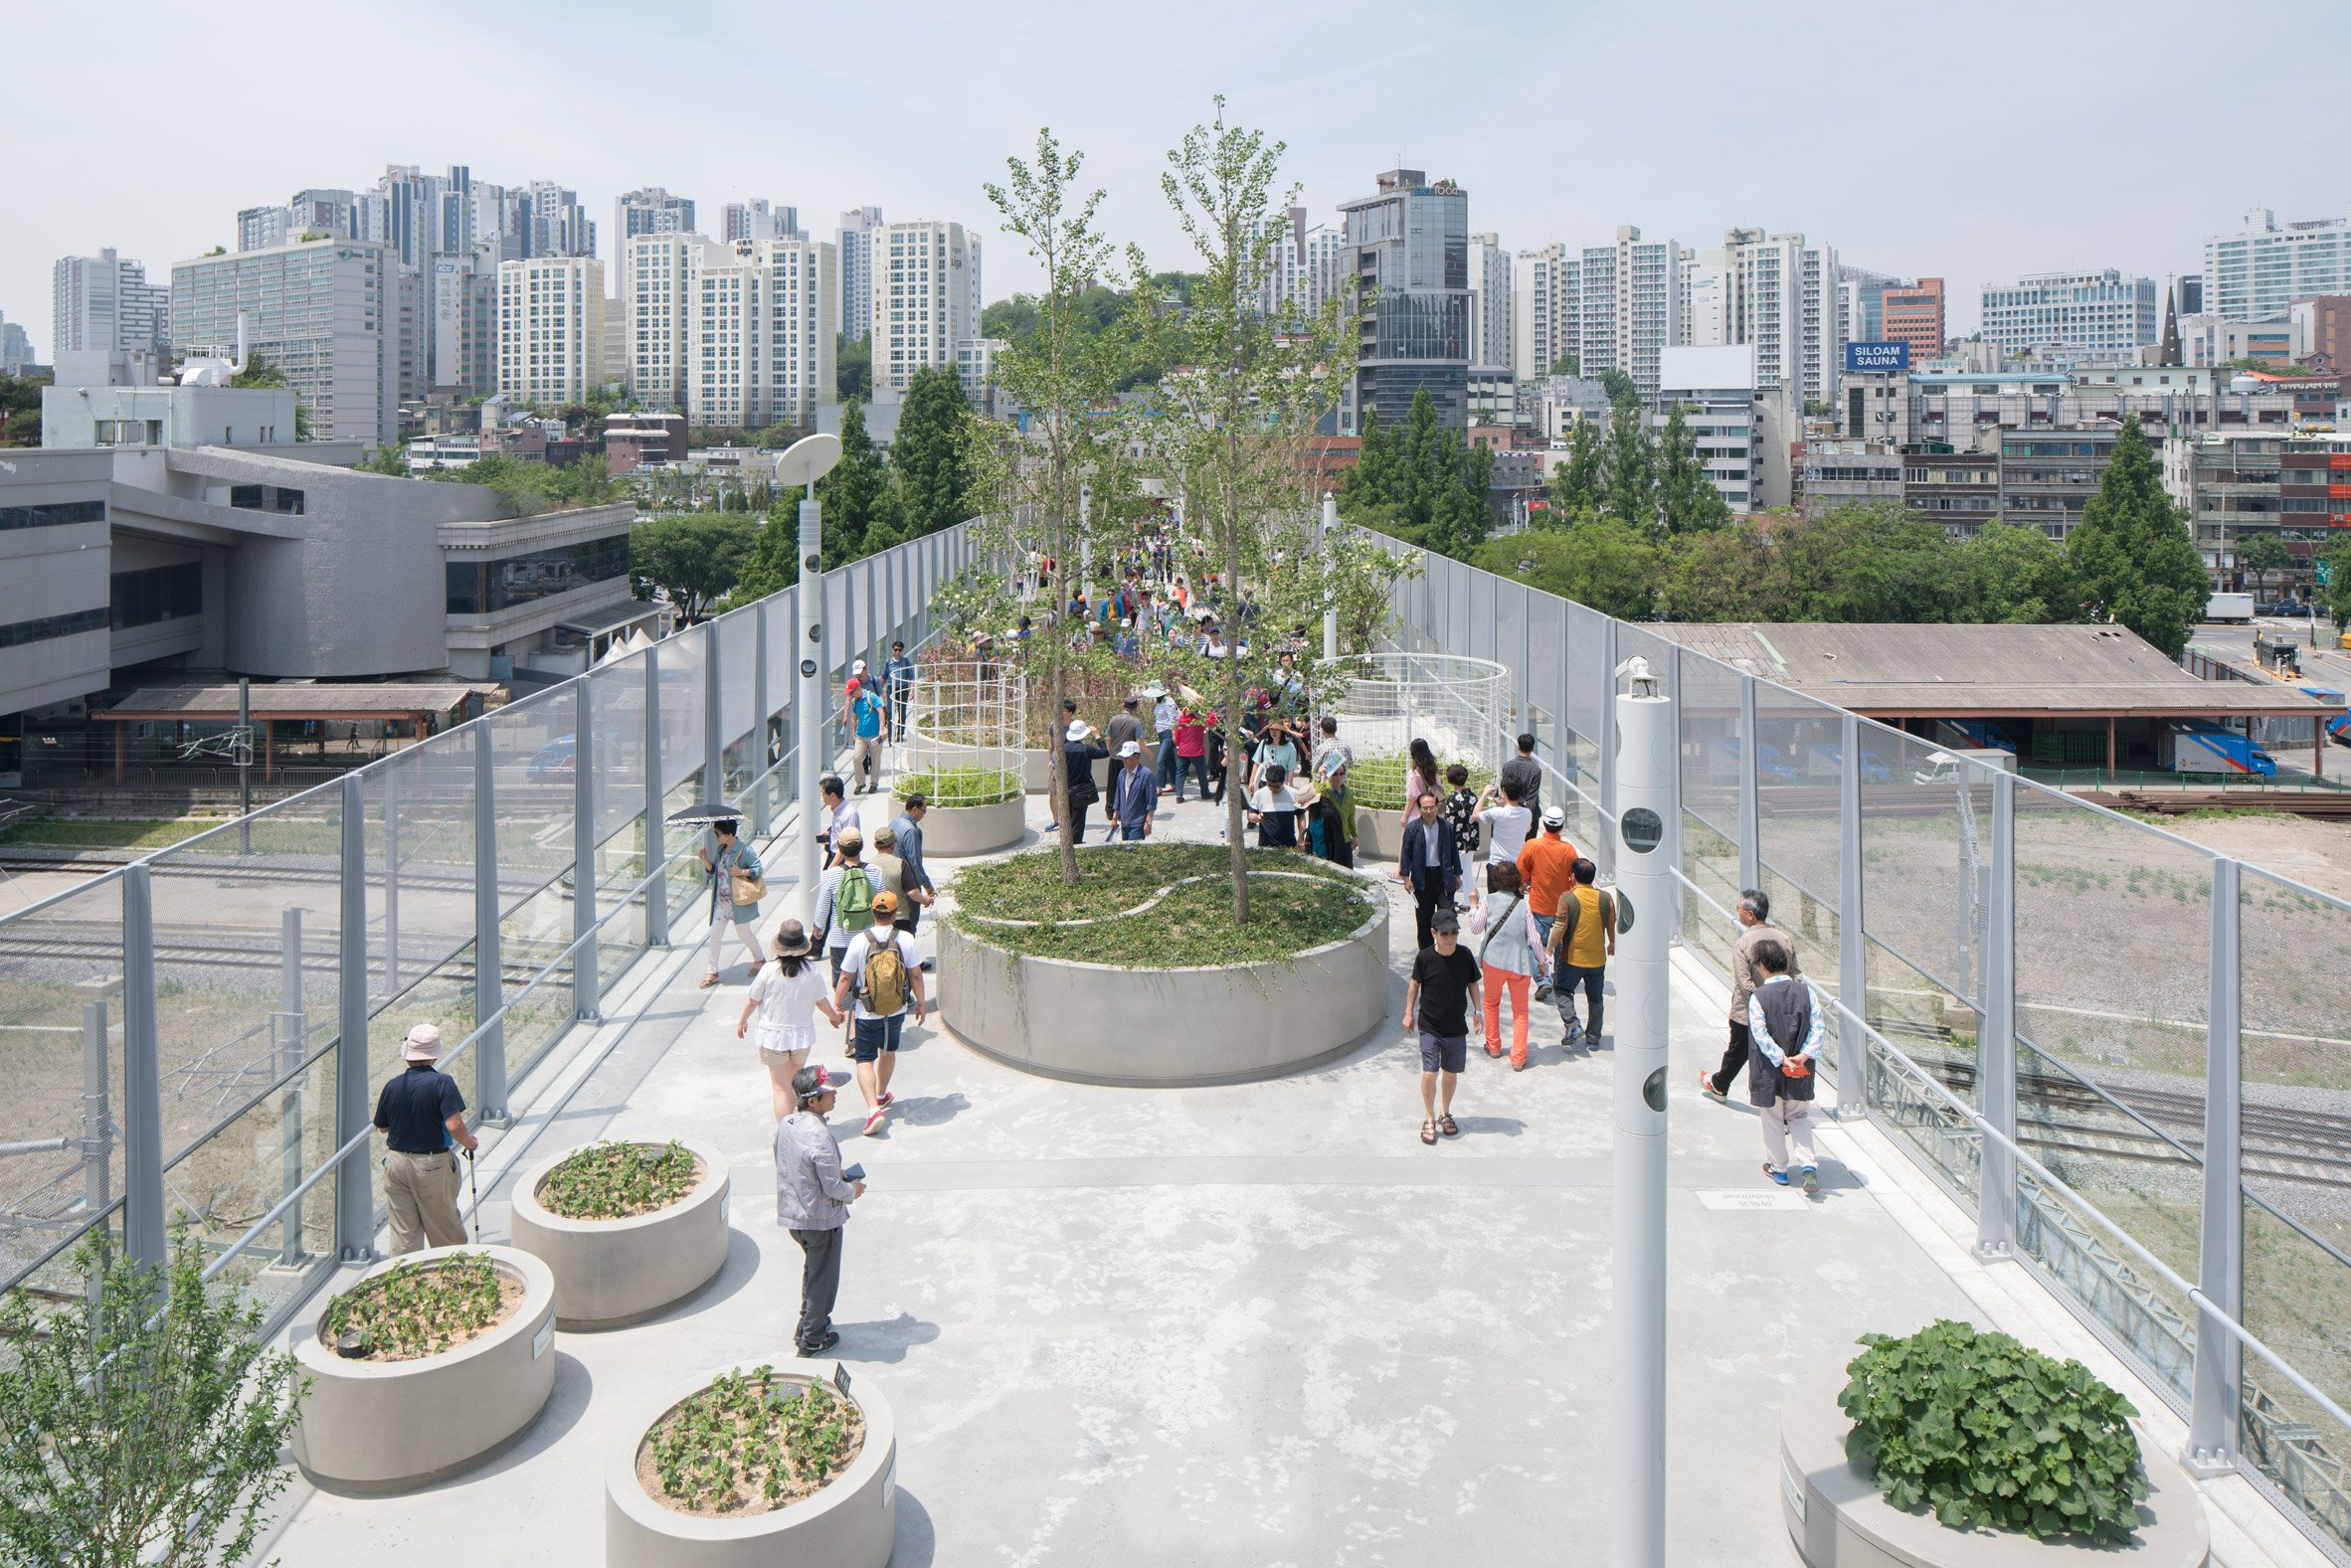 skygarden-mvrdv-architecture-landscape-urbanism-seoul-south-korea-_dezeen_2364_col_16.jpg